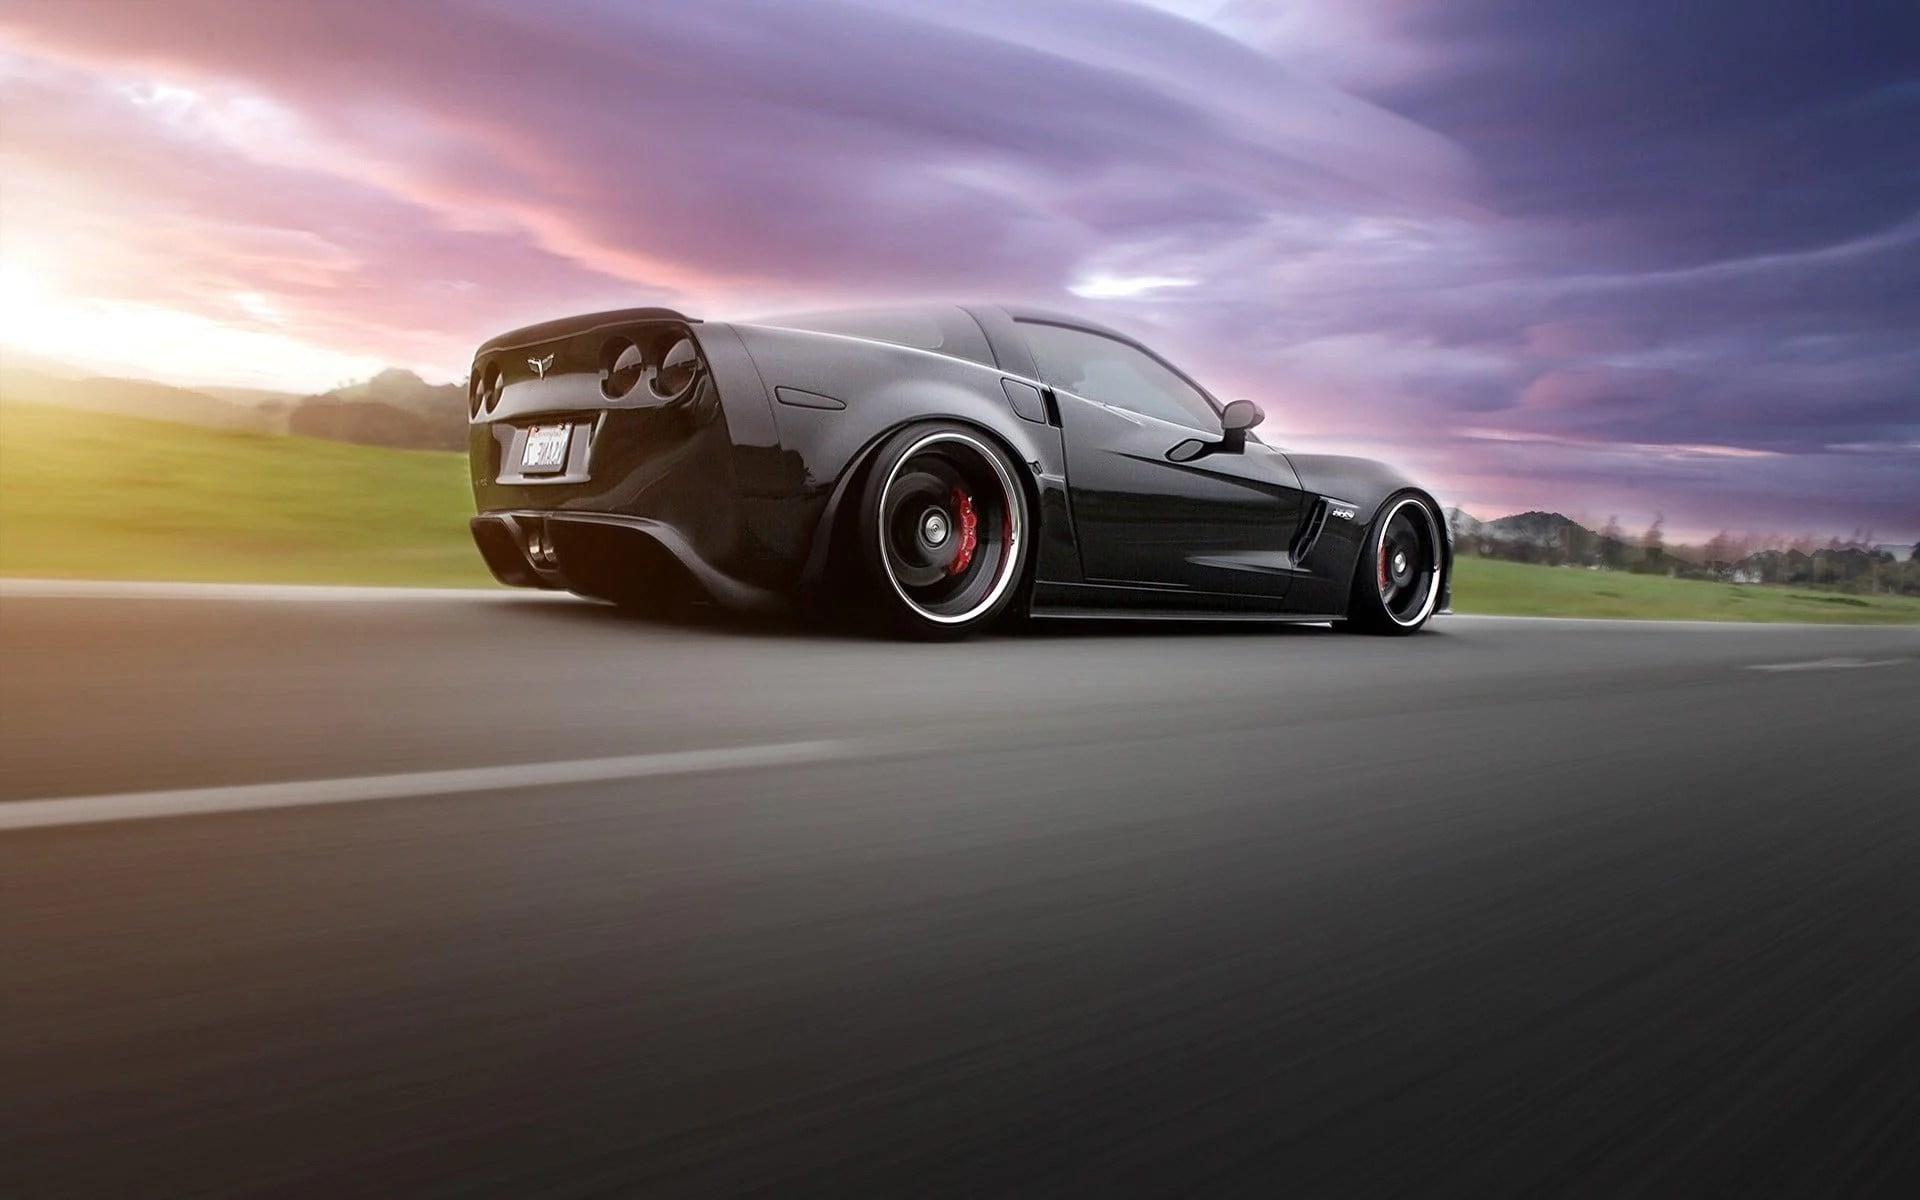 C6 Corvette Wallpapers Top Free C6 Corvette Backgrounds